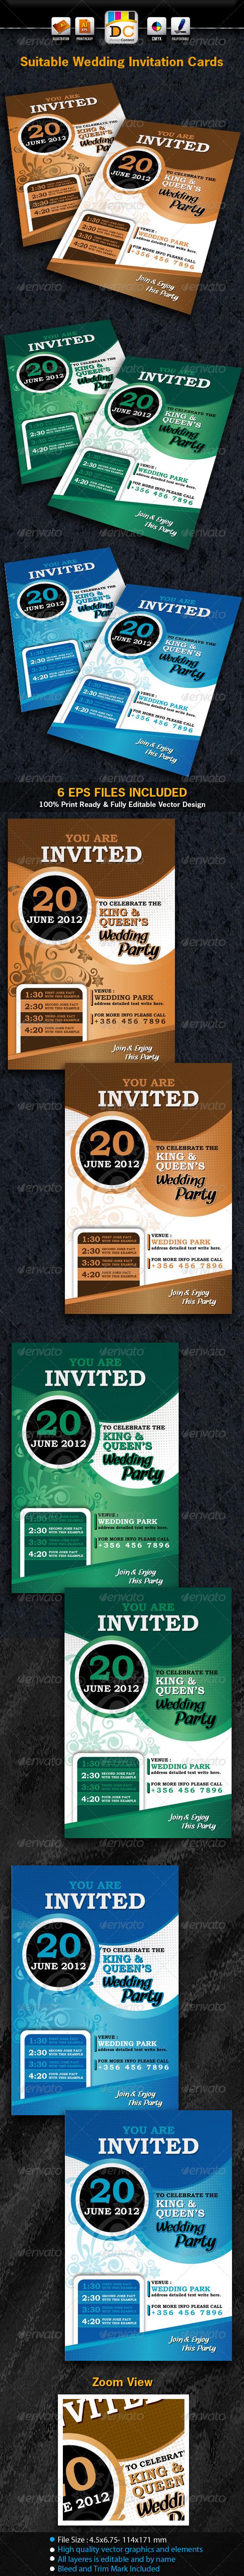 GraphicRiver Suitable Wedding Marriage Invitation Card Sets 2577188